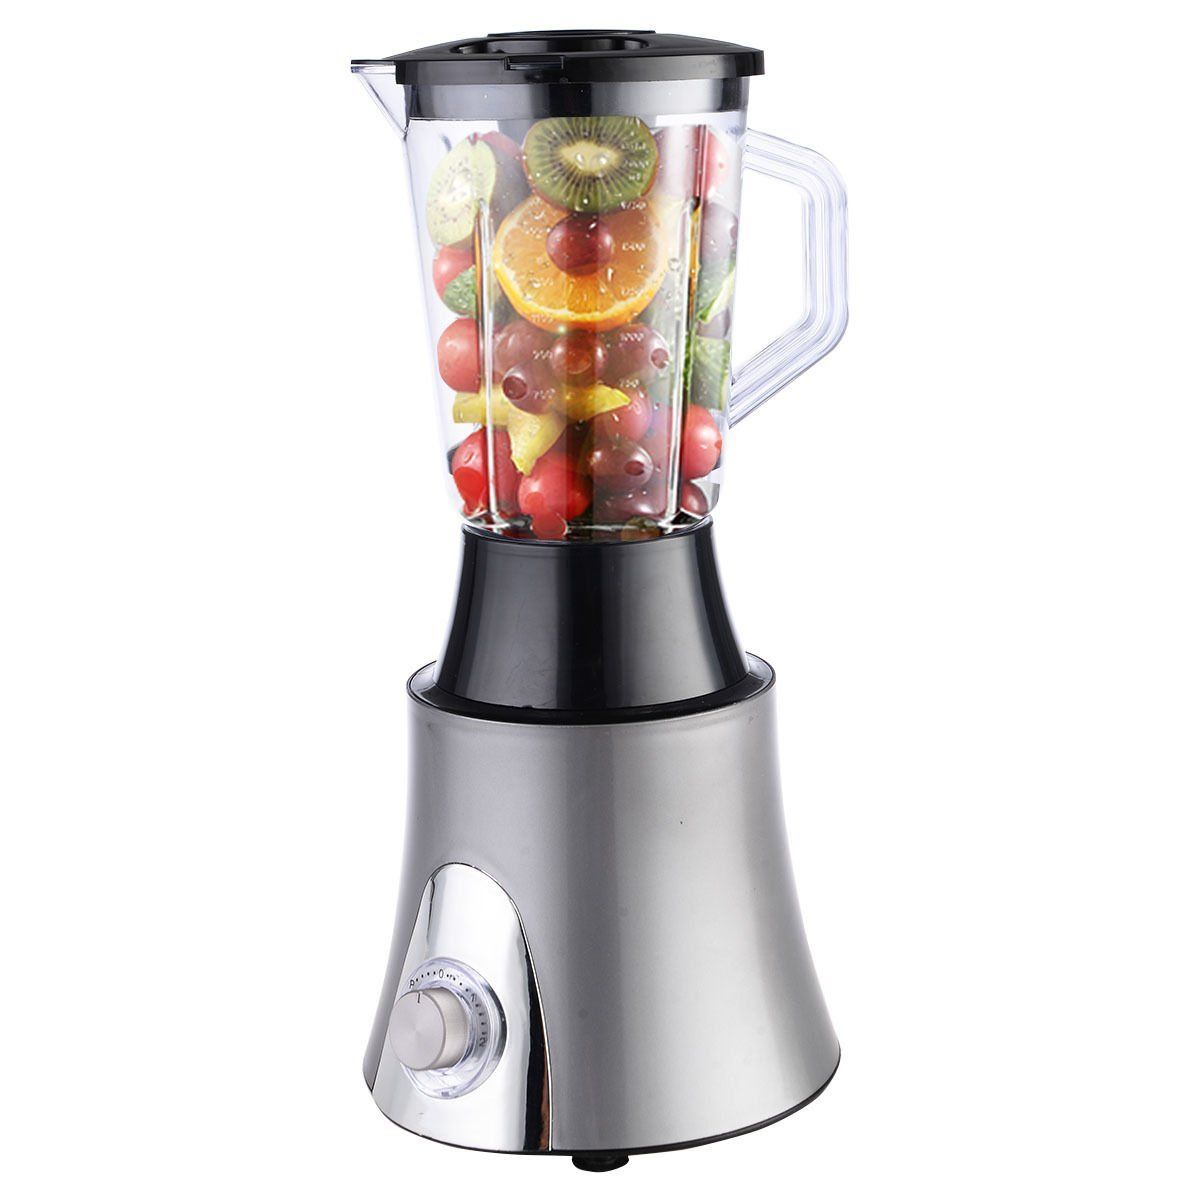 Costzon 4in1 electric blender smoothie maker